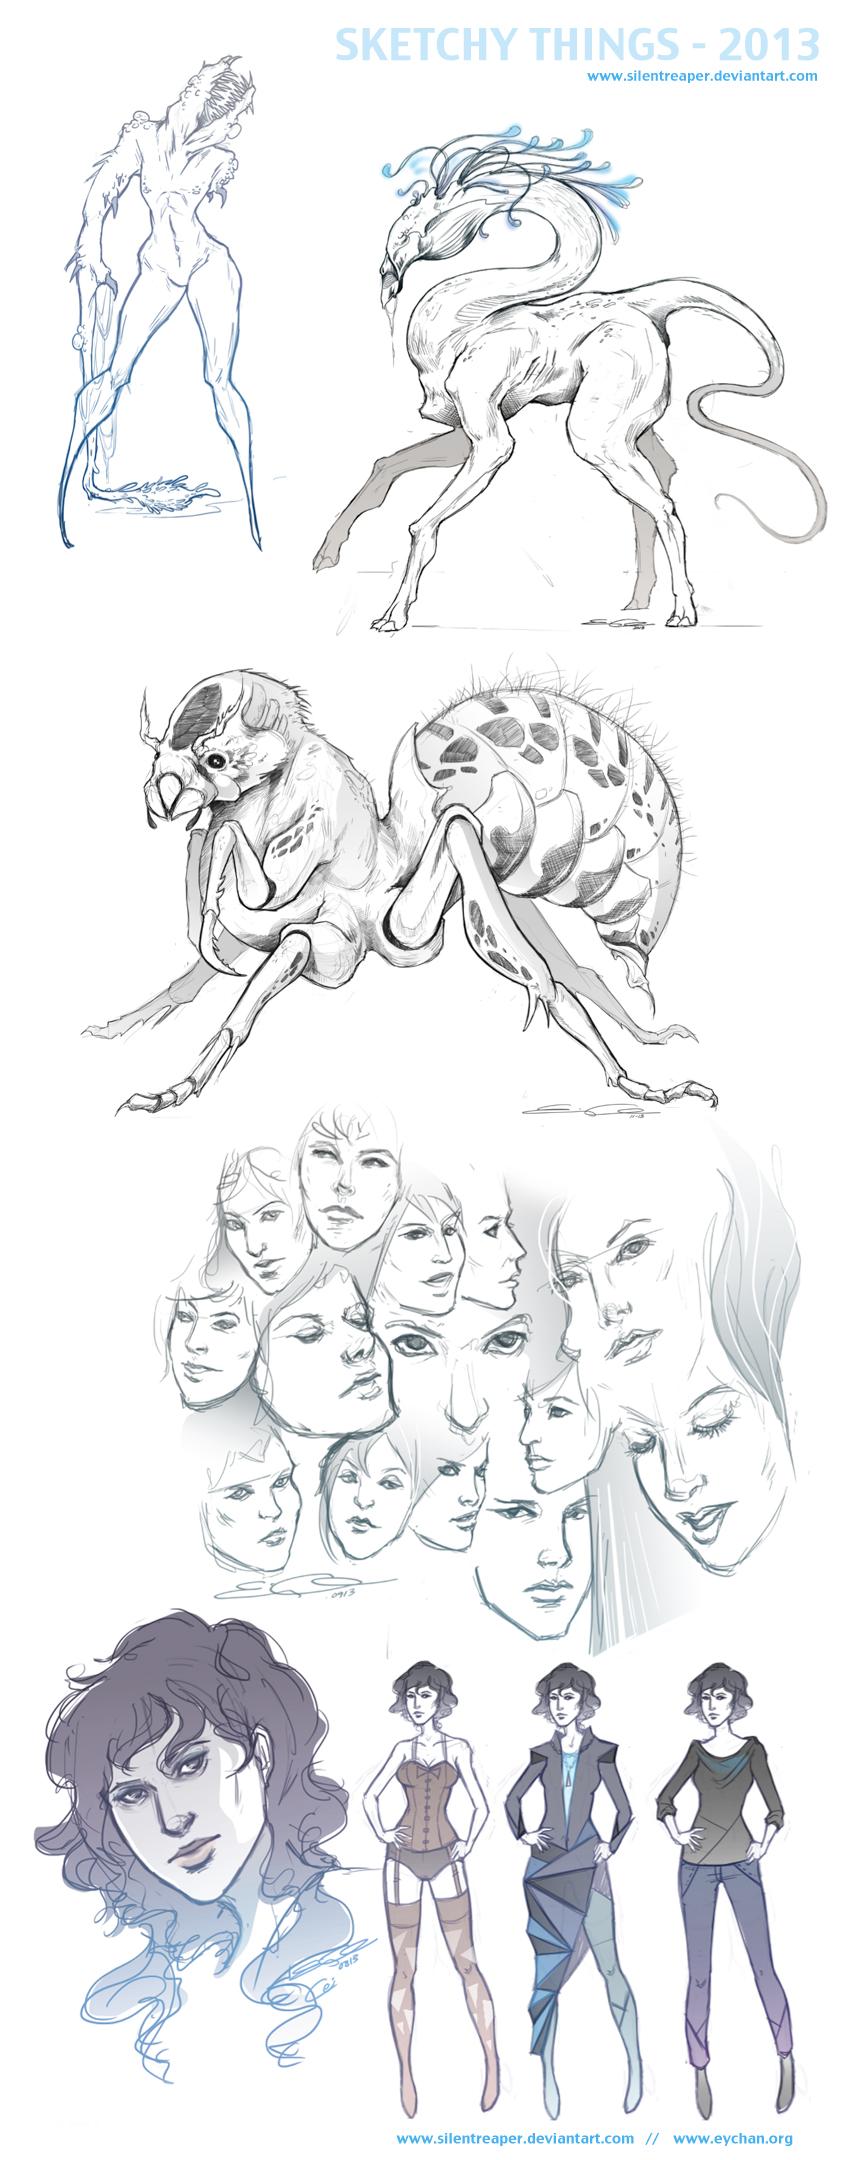 Sketchy Things by SilentReaper